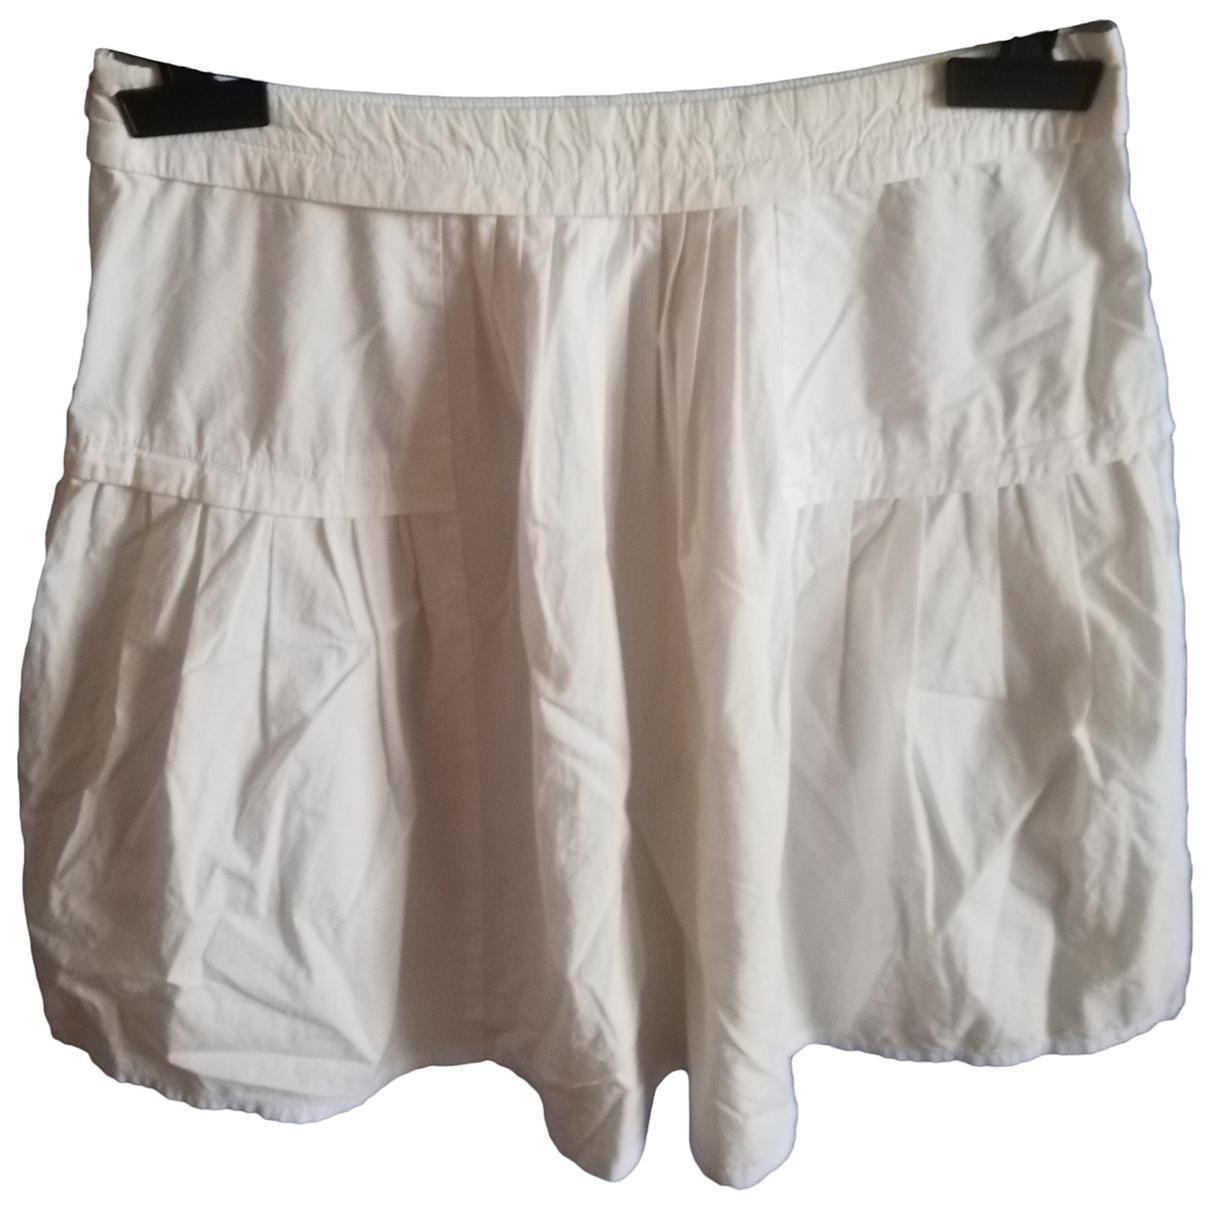 Max & Co \N White Cotton skirt for Women 40 IT